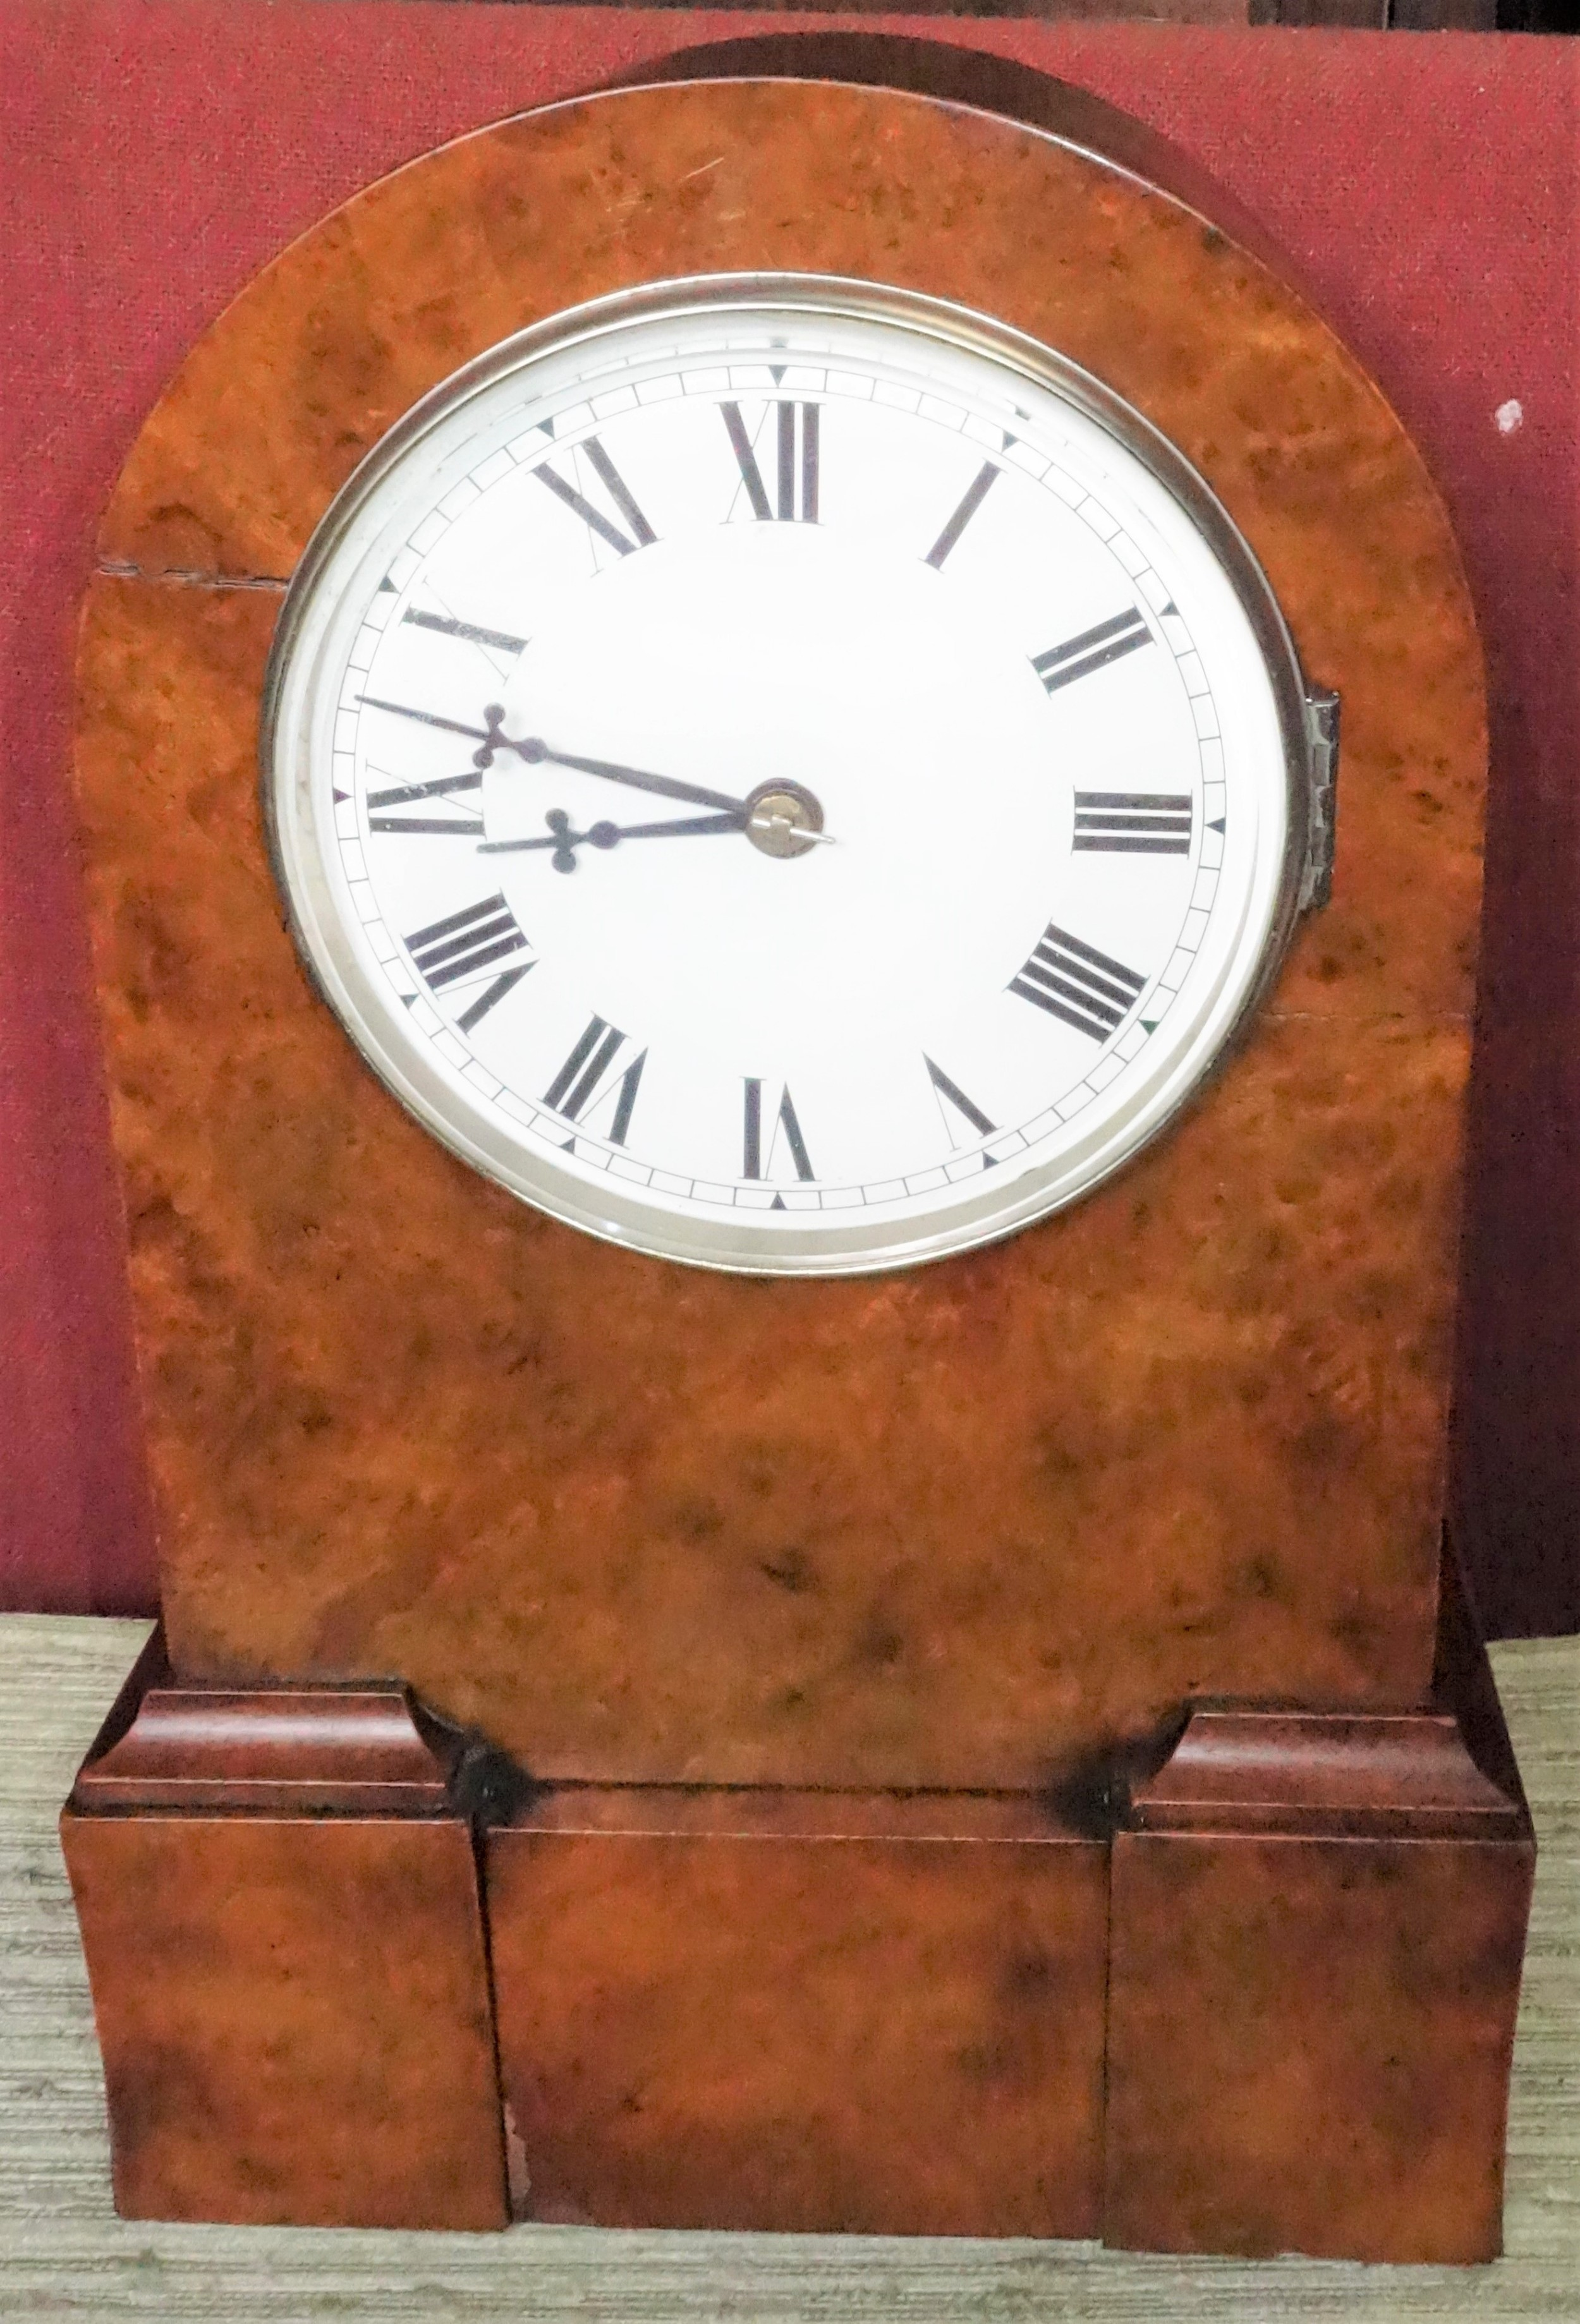 late 19th century burr walnut cased 8 day striking mantelmantle clock circa 1890 with secrets